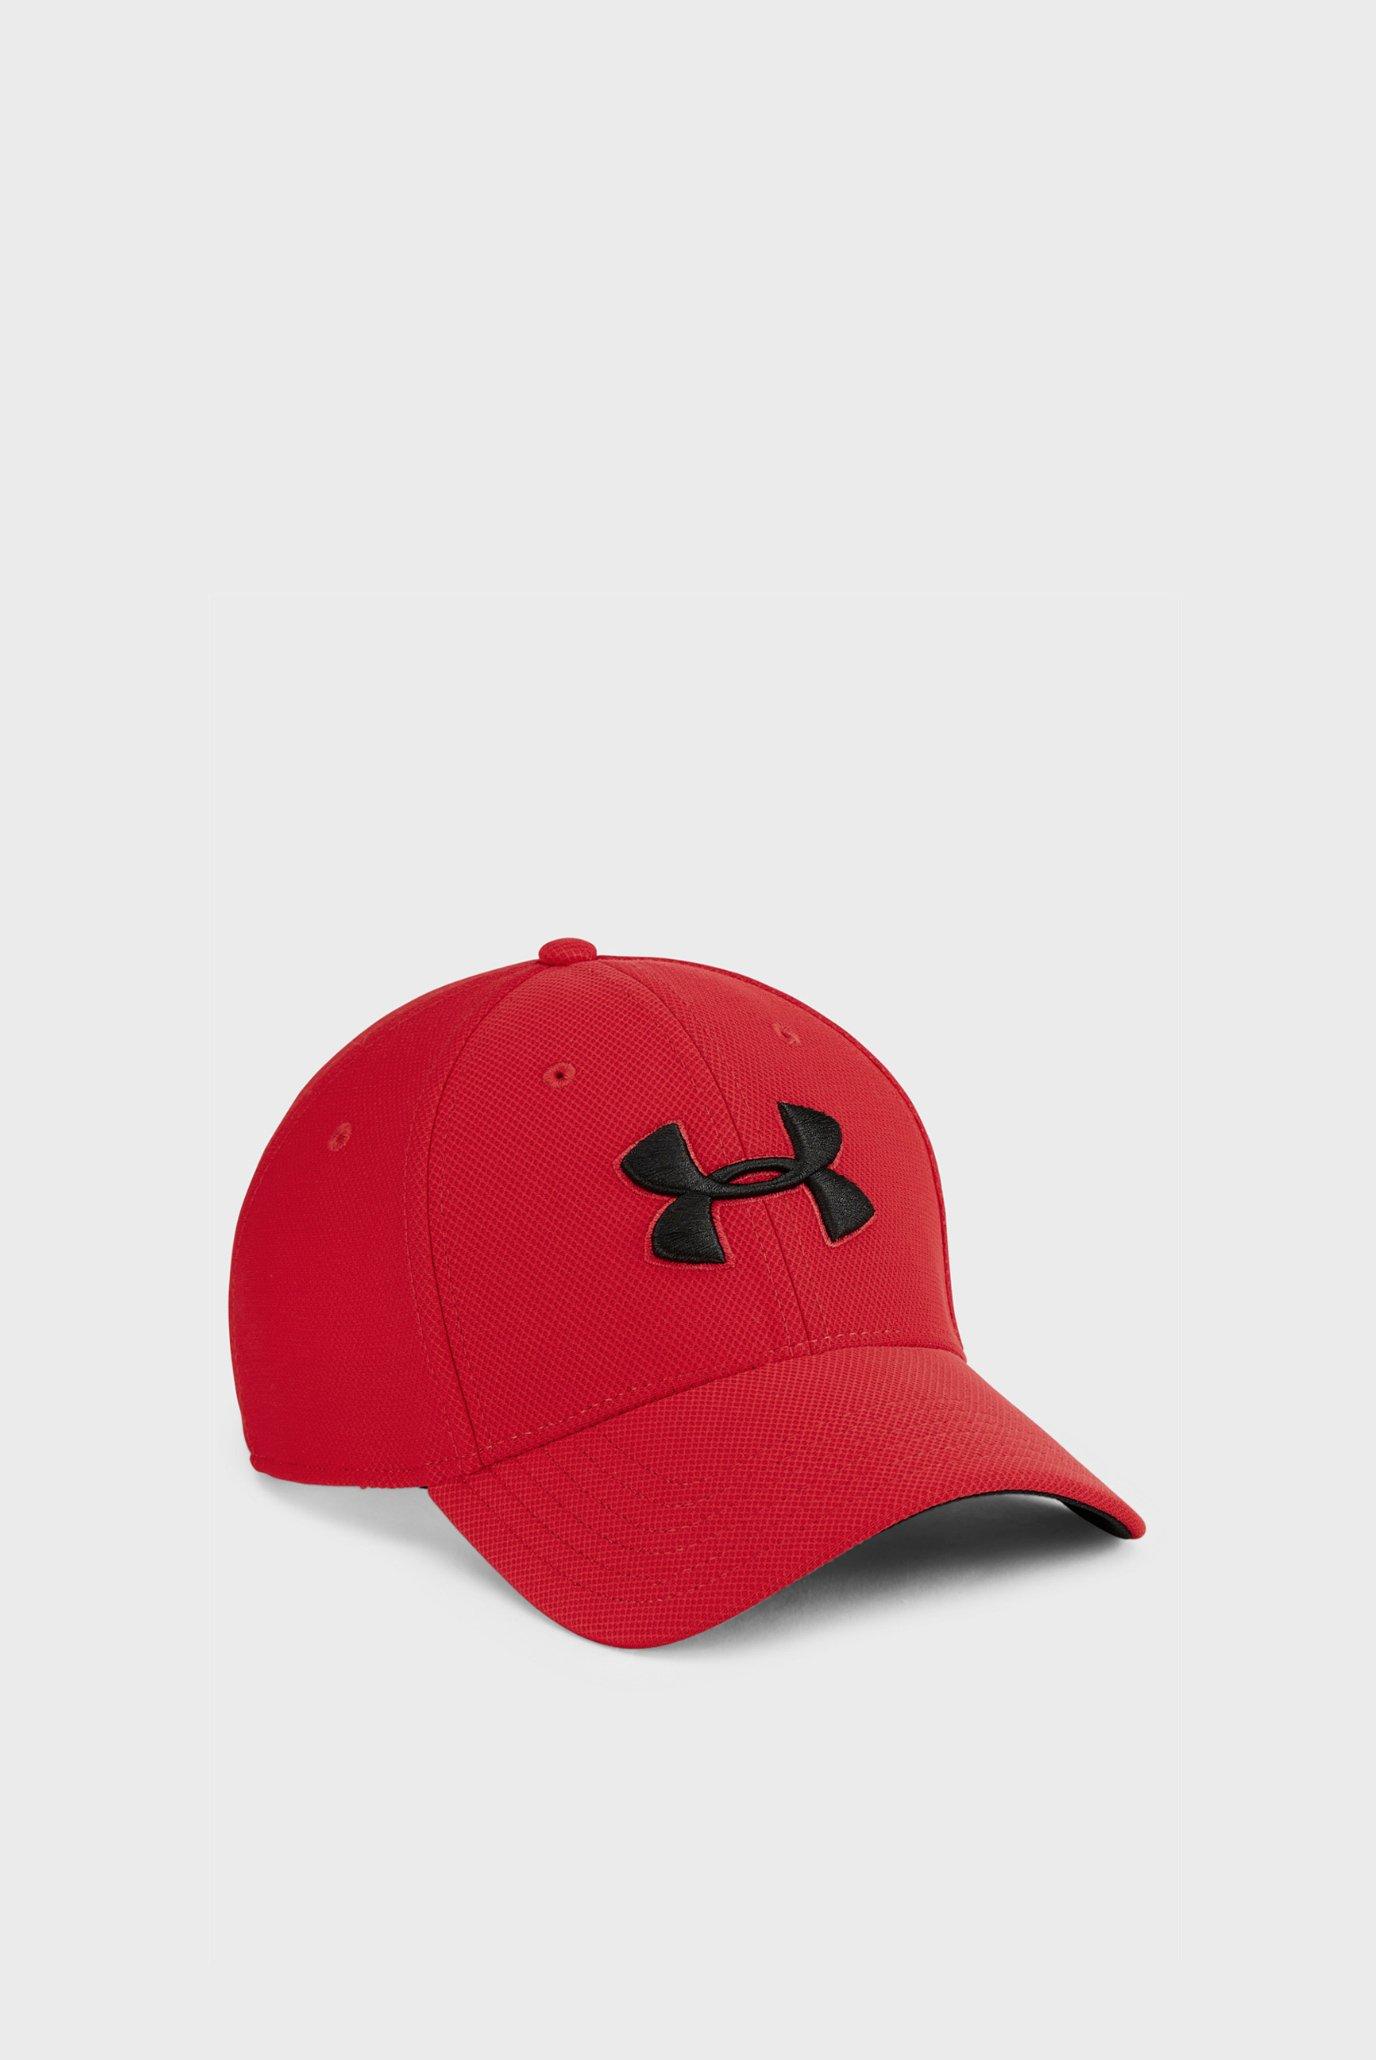 Мужская красная кепка Men's Blitzing 3.0 Cap Under Armour